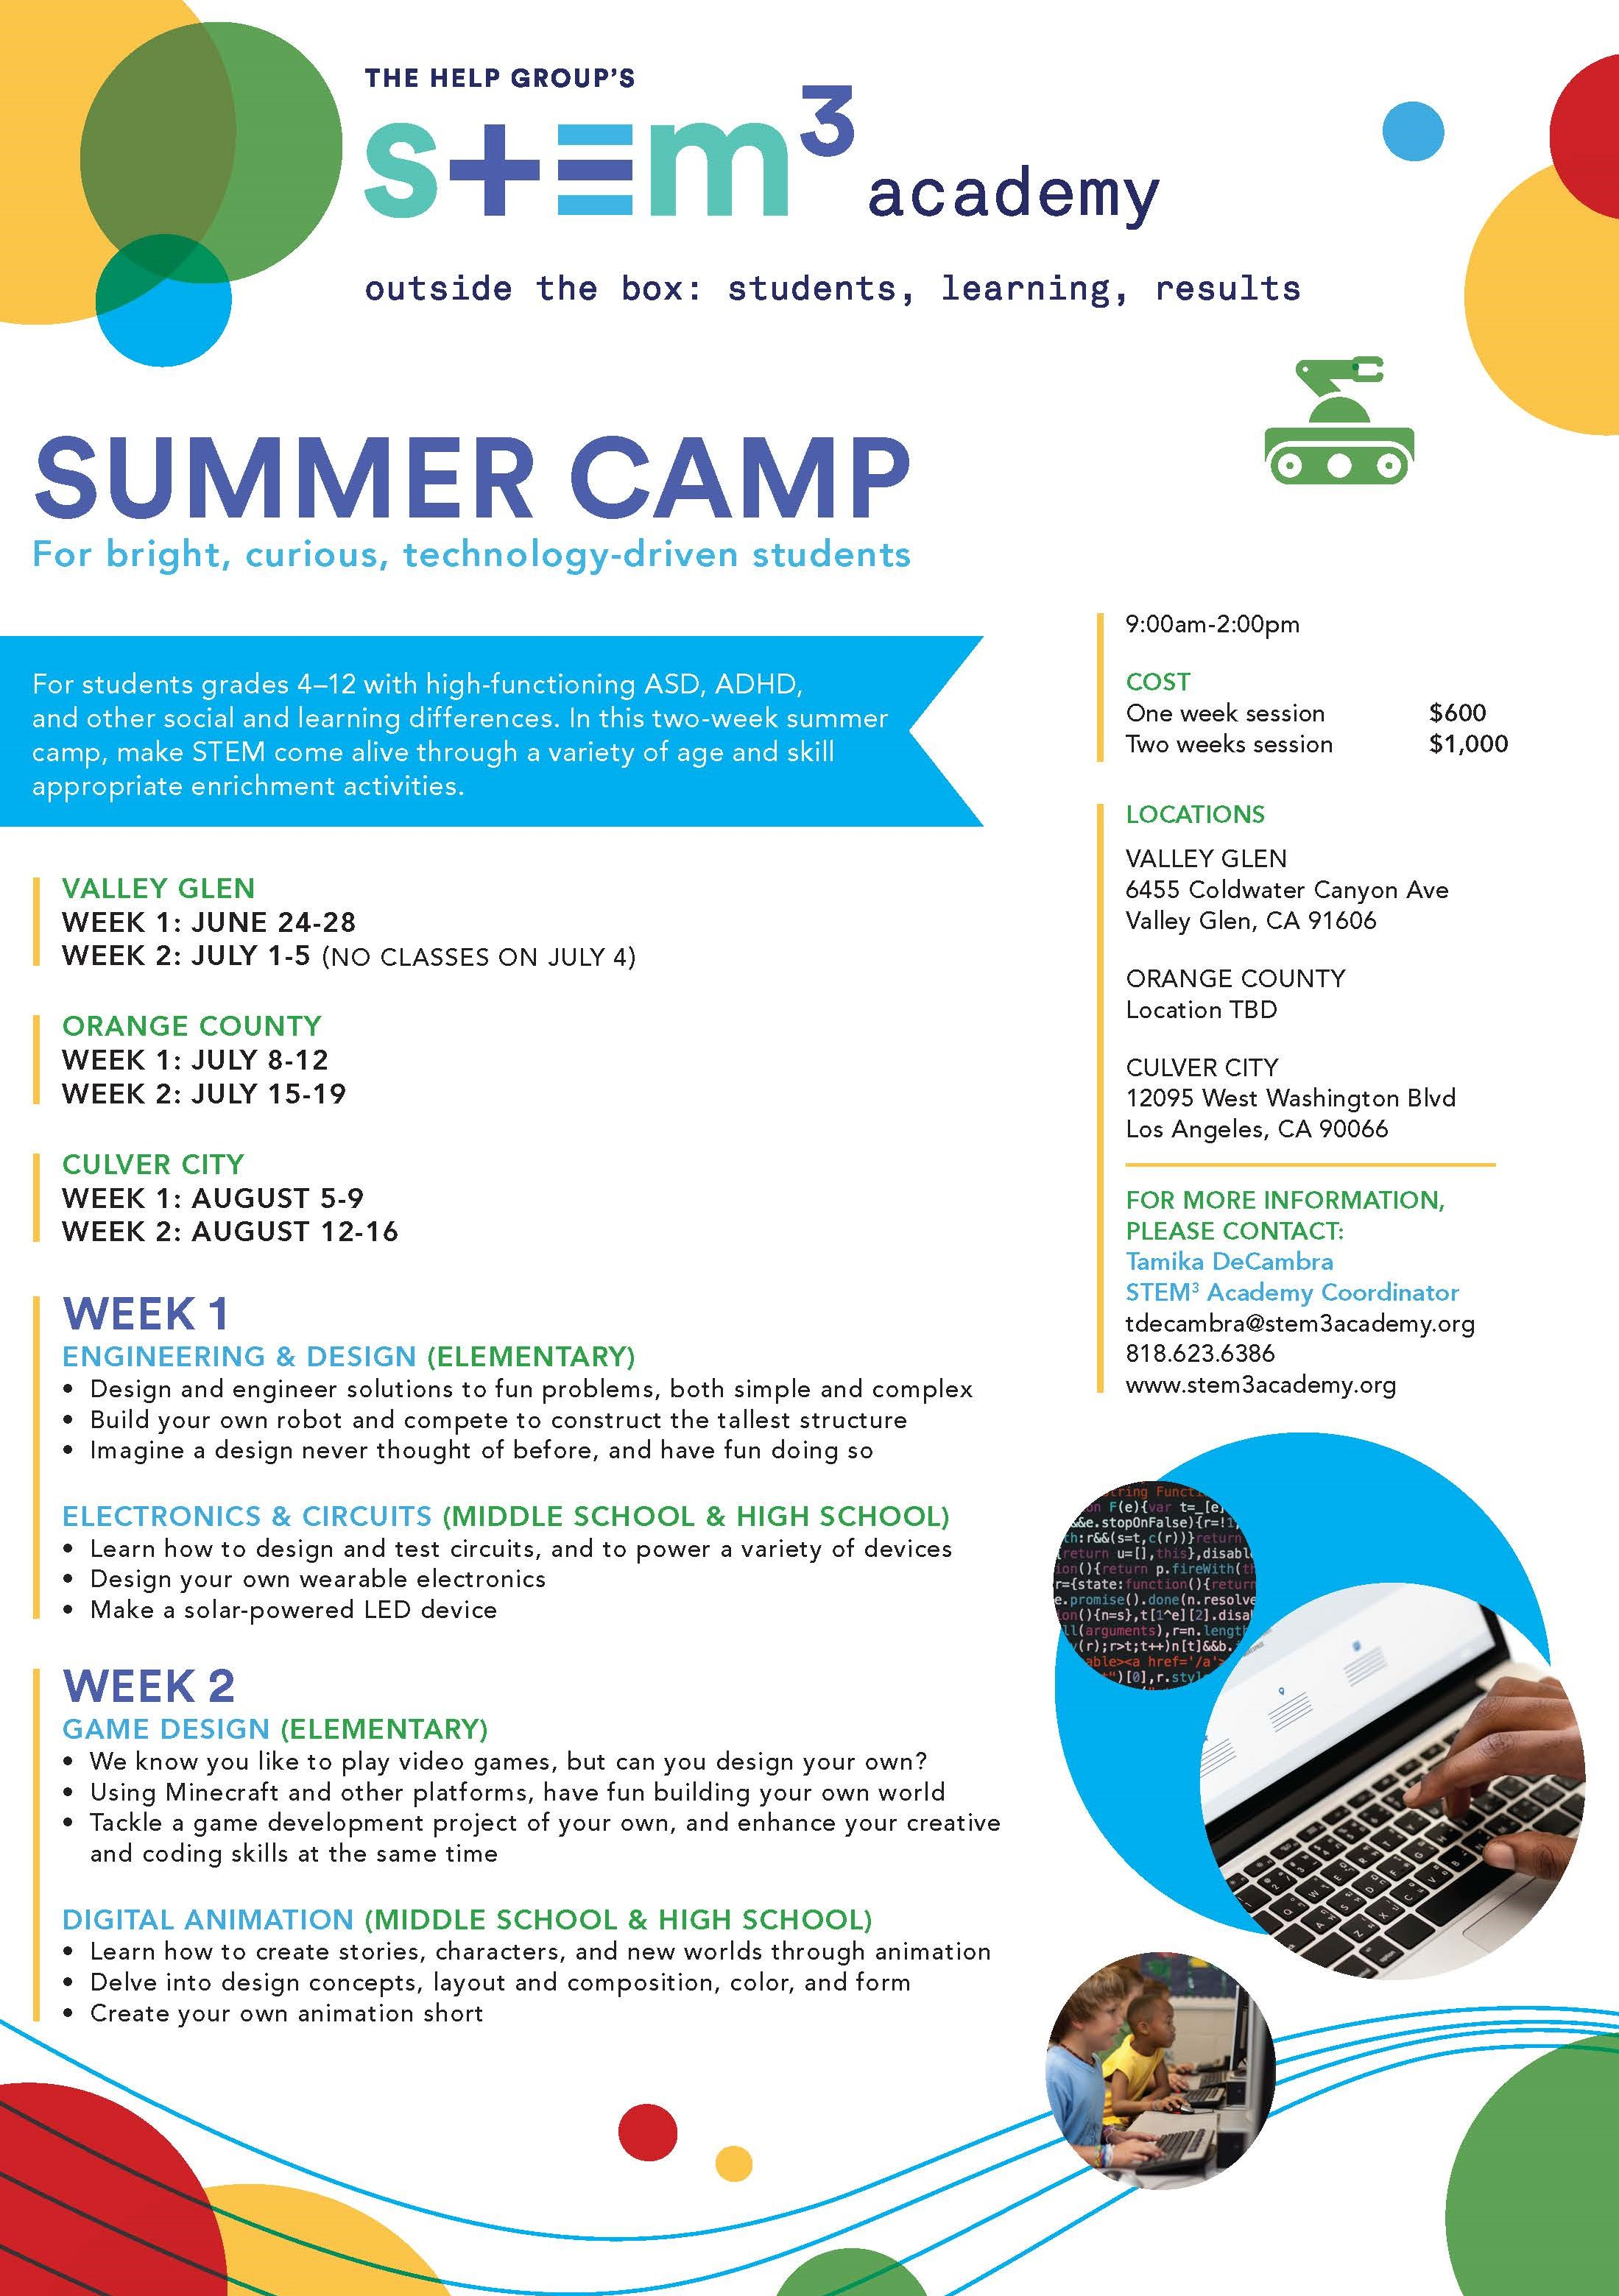 STEM3 Academy Summer Camp - Kids Like Me